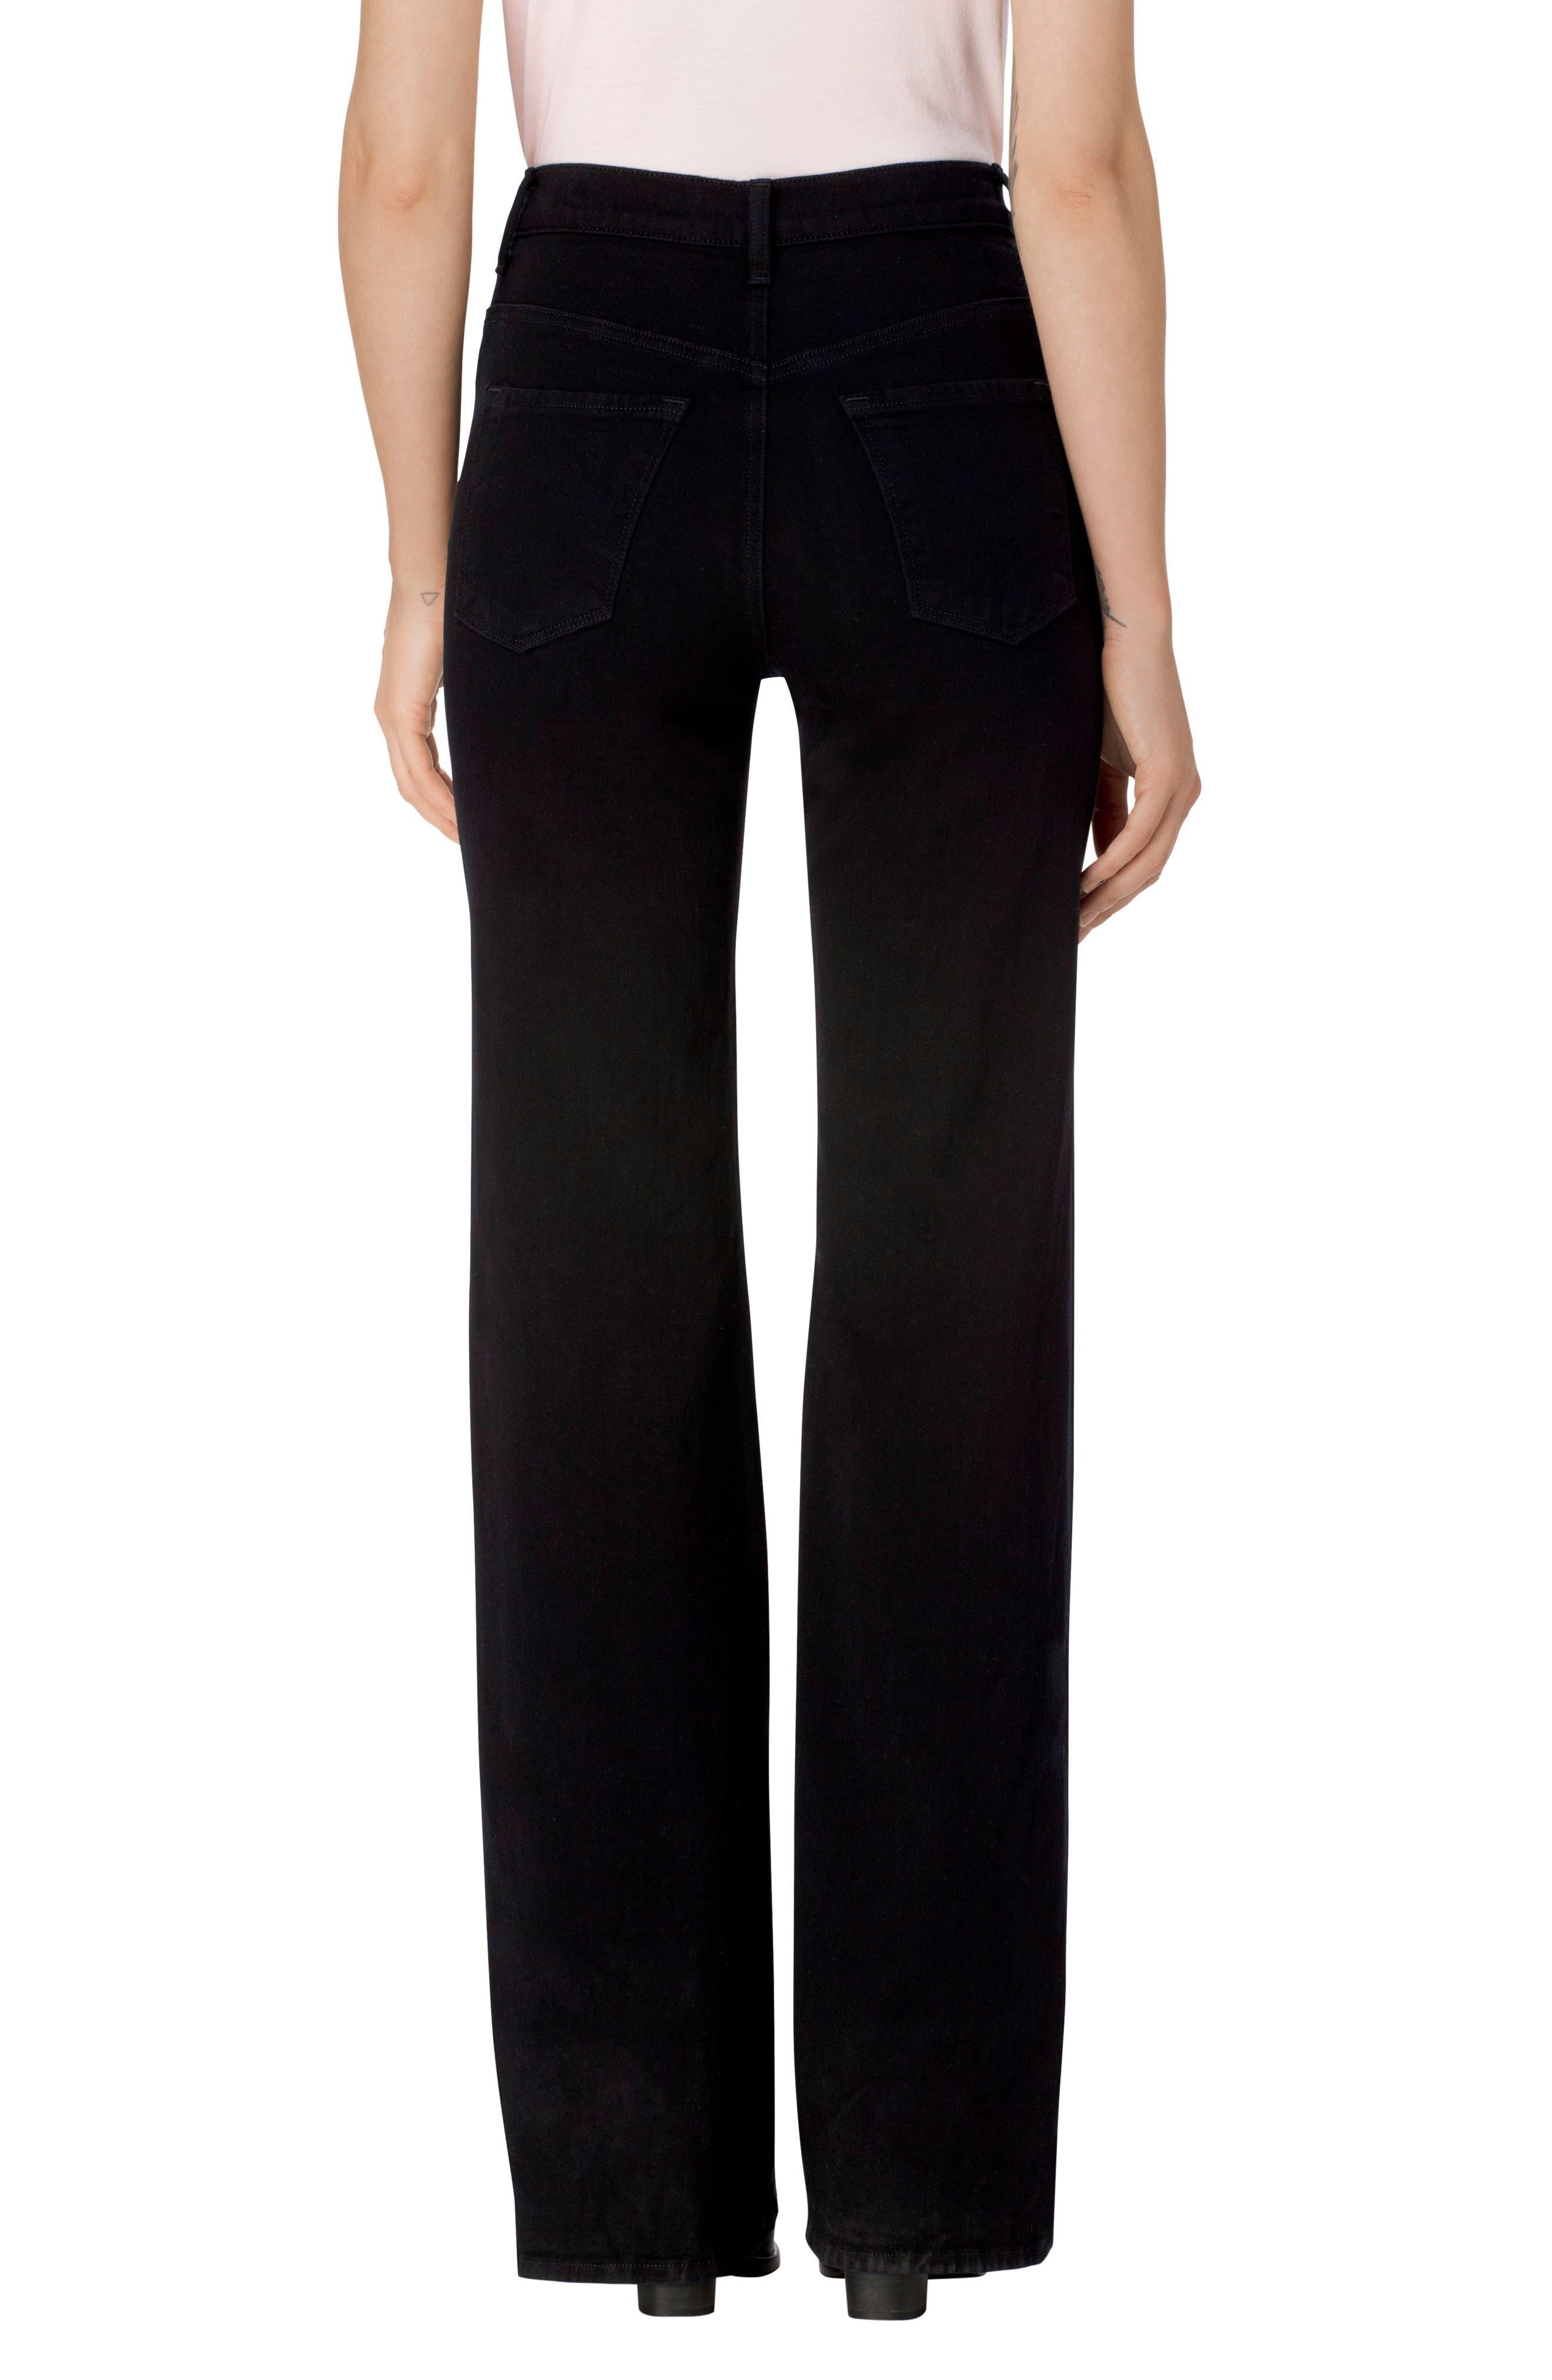 Joan High Waist Wide Leg Jeans,                             Alternate thumbnail 2, color,                             Pitch Black